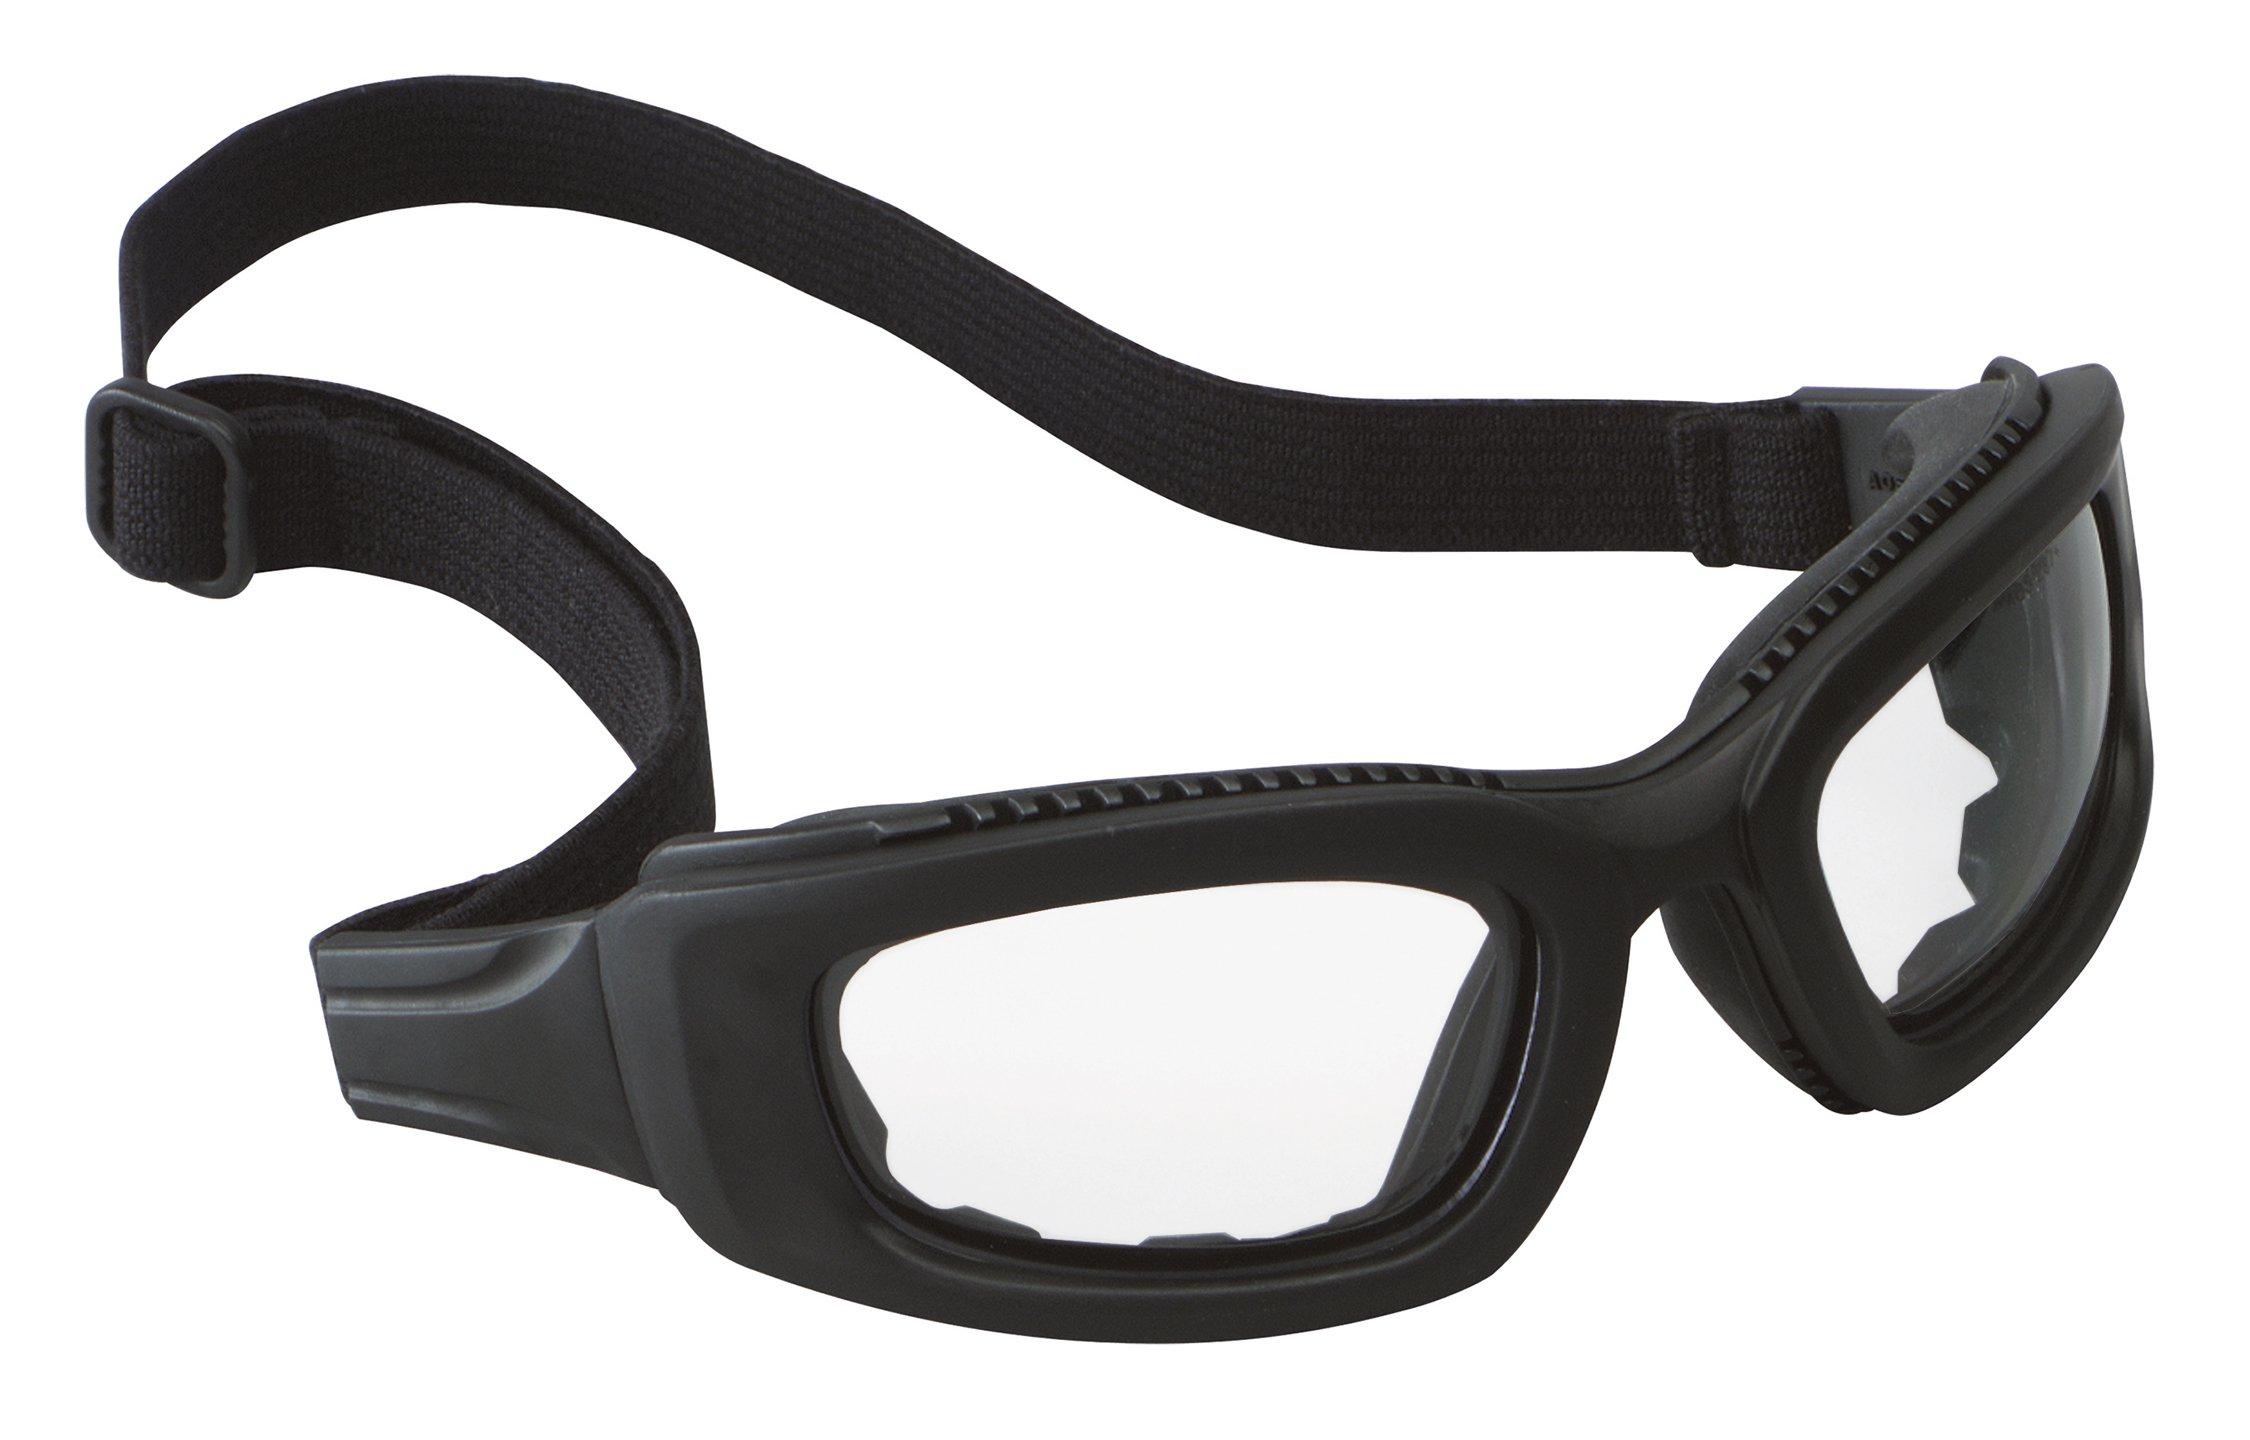 3M Maxim Safety Goggle 2x2, 40686-00000-10 Clear Anti-Fog Lens, Black Frame, Elastic Strap  (Pack of 1)